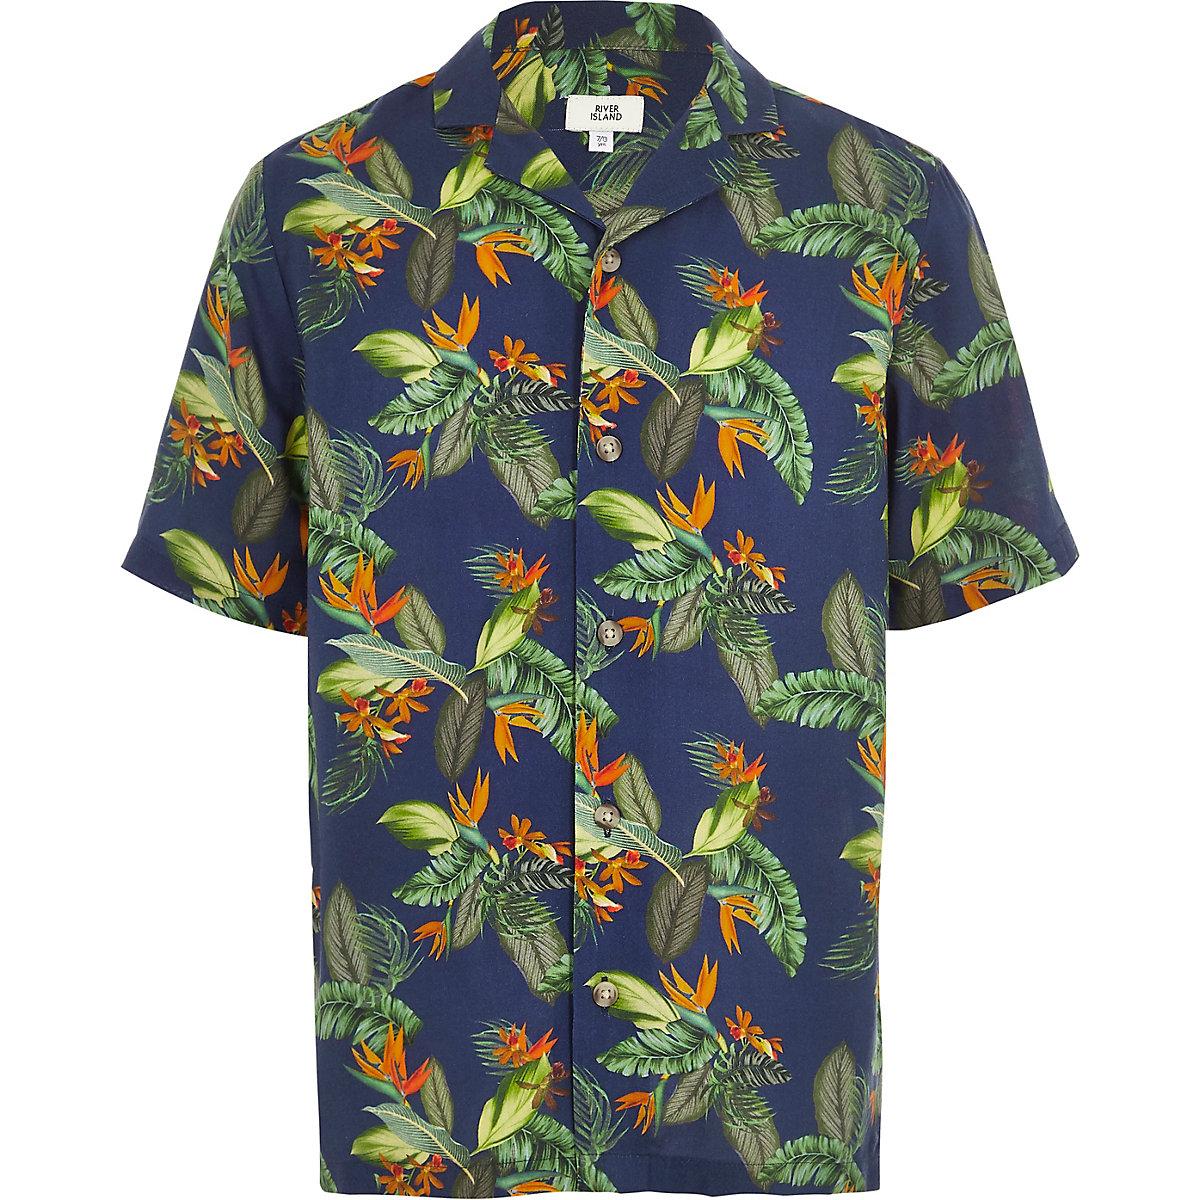 Boys navy tropical print short sleeve shirt